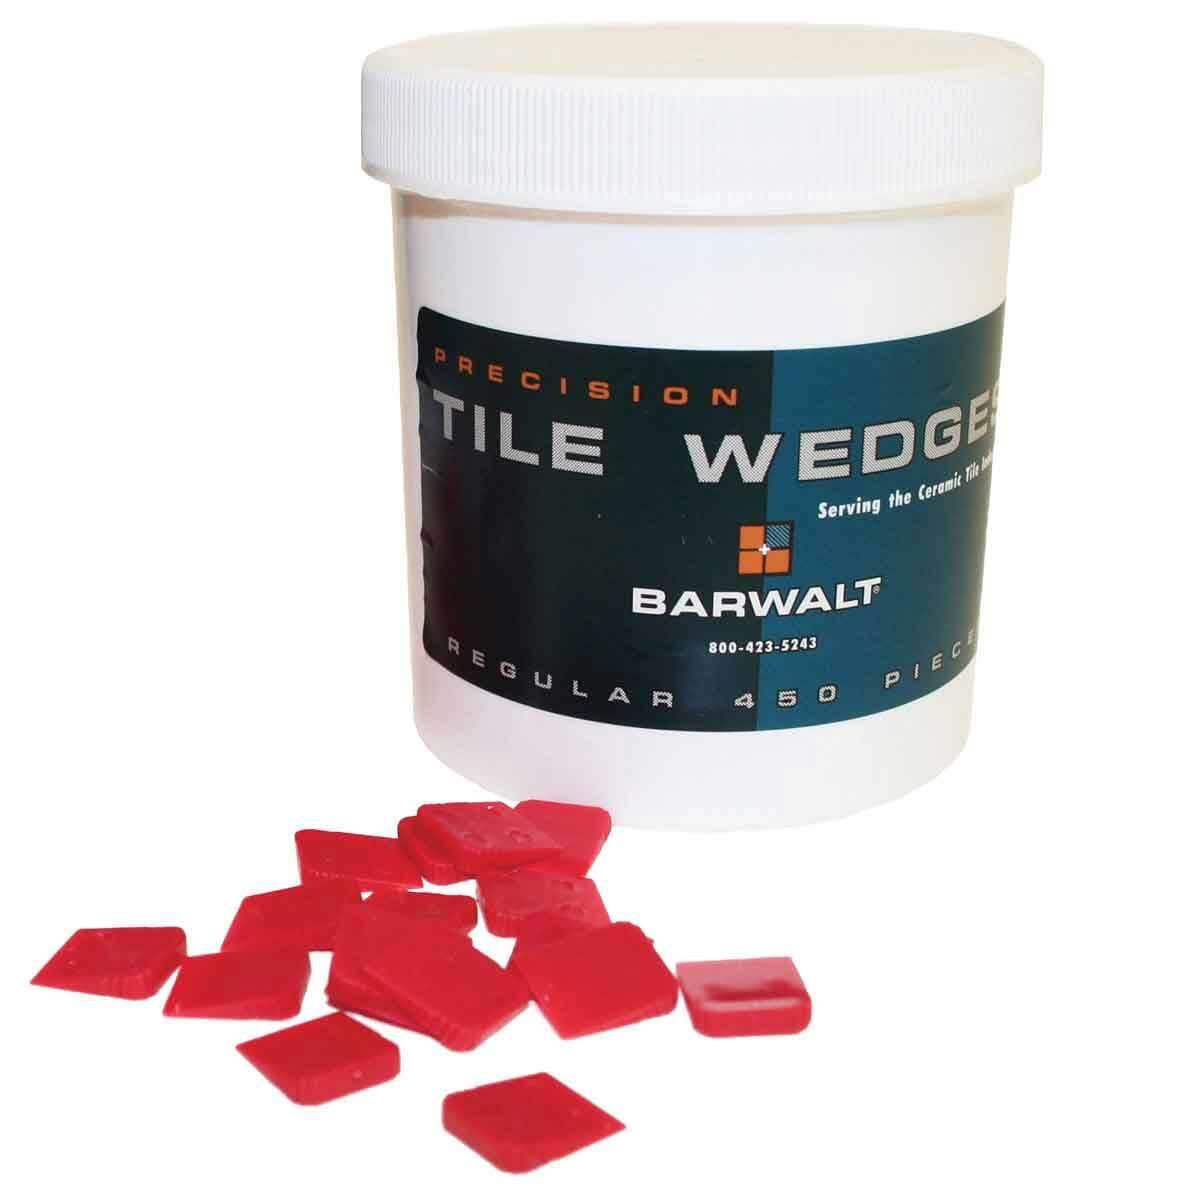 barwalt blue gripper tile wedge